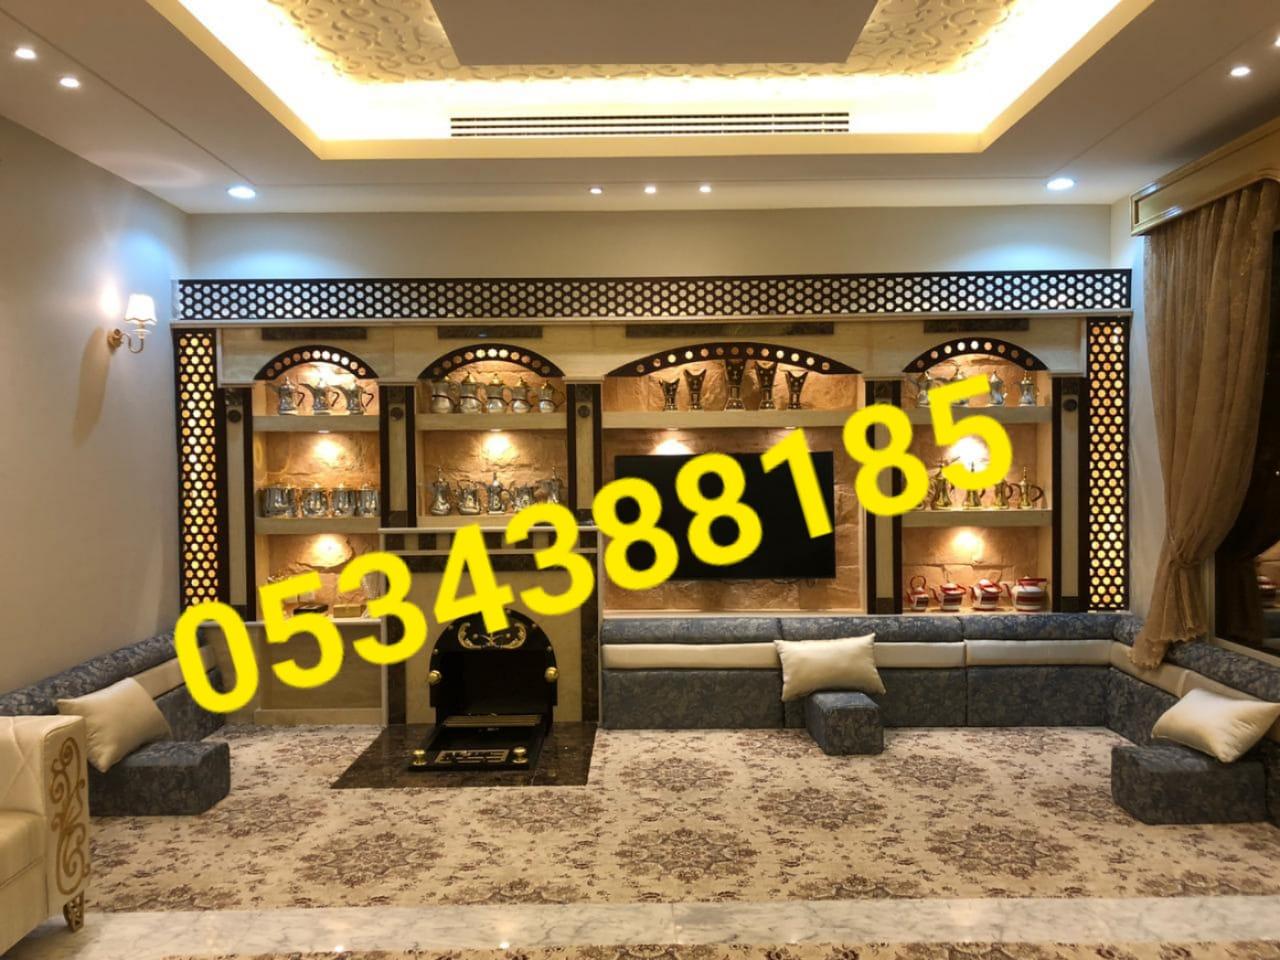 0534388185 ديكورات p_1636xrmpk2.jpg